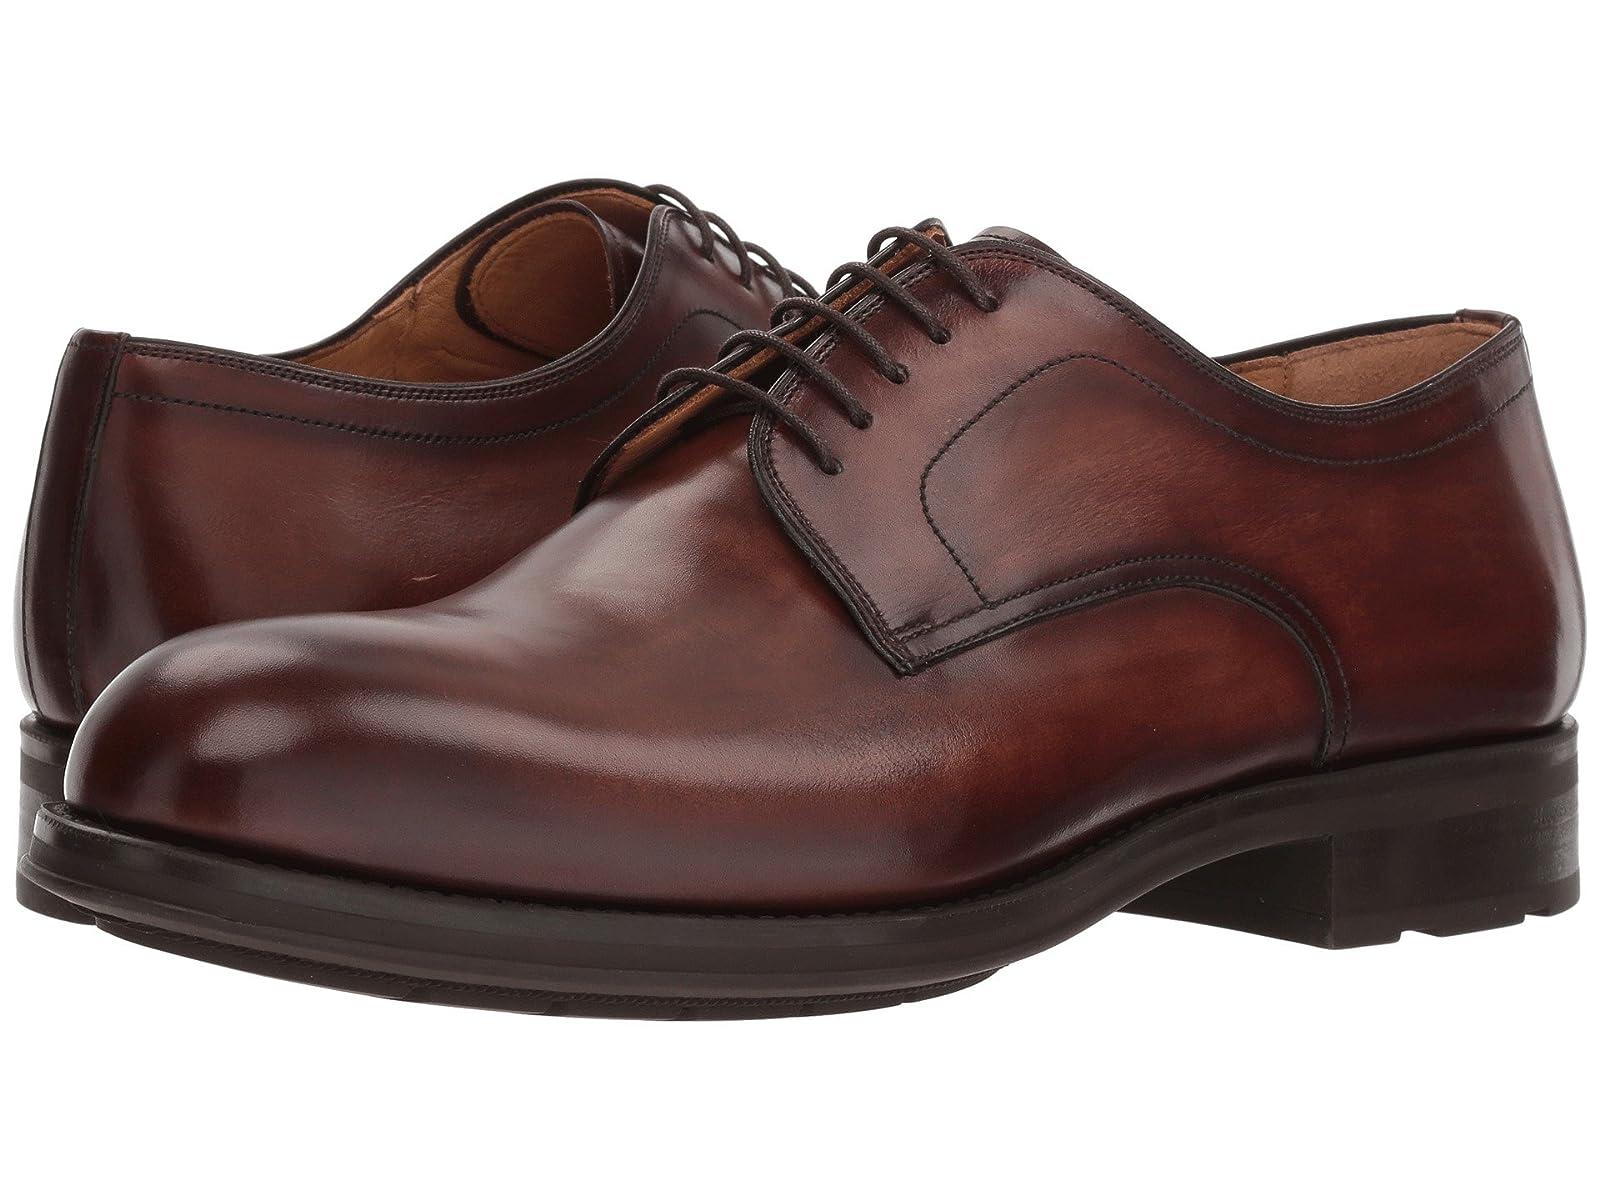 Magnanni SolanoAtmospheric grades have affordable shoes